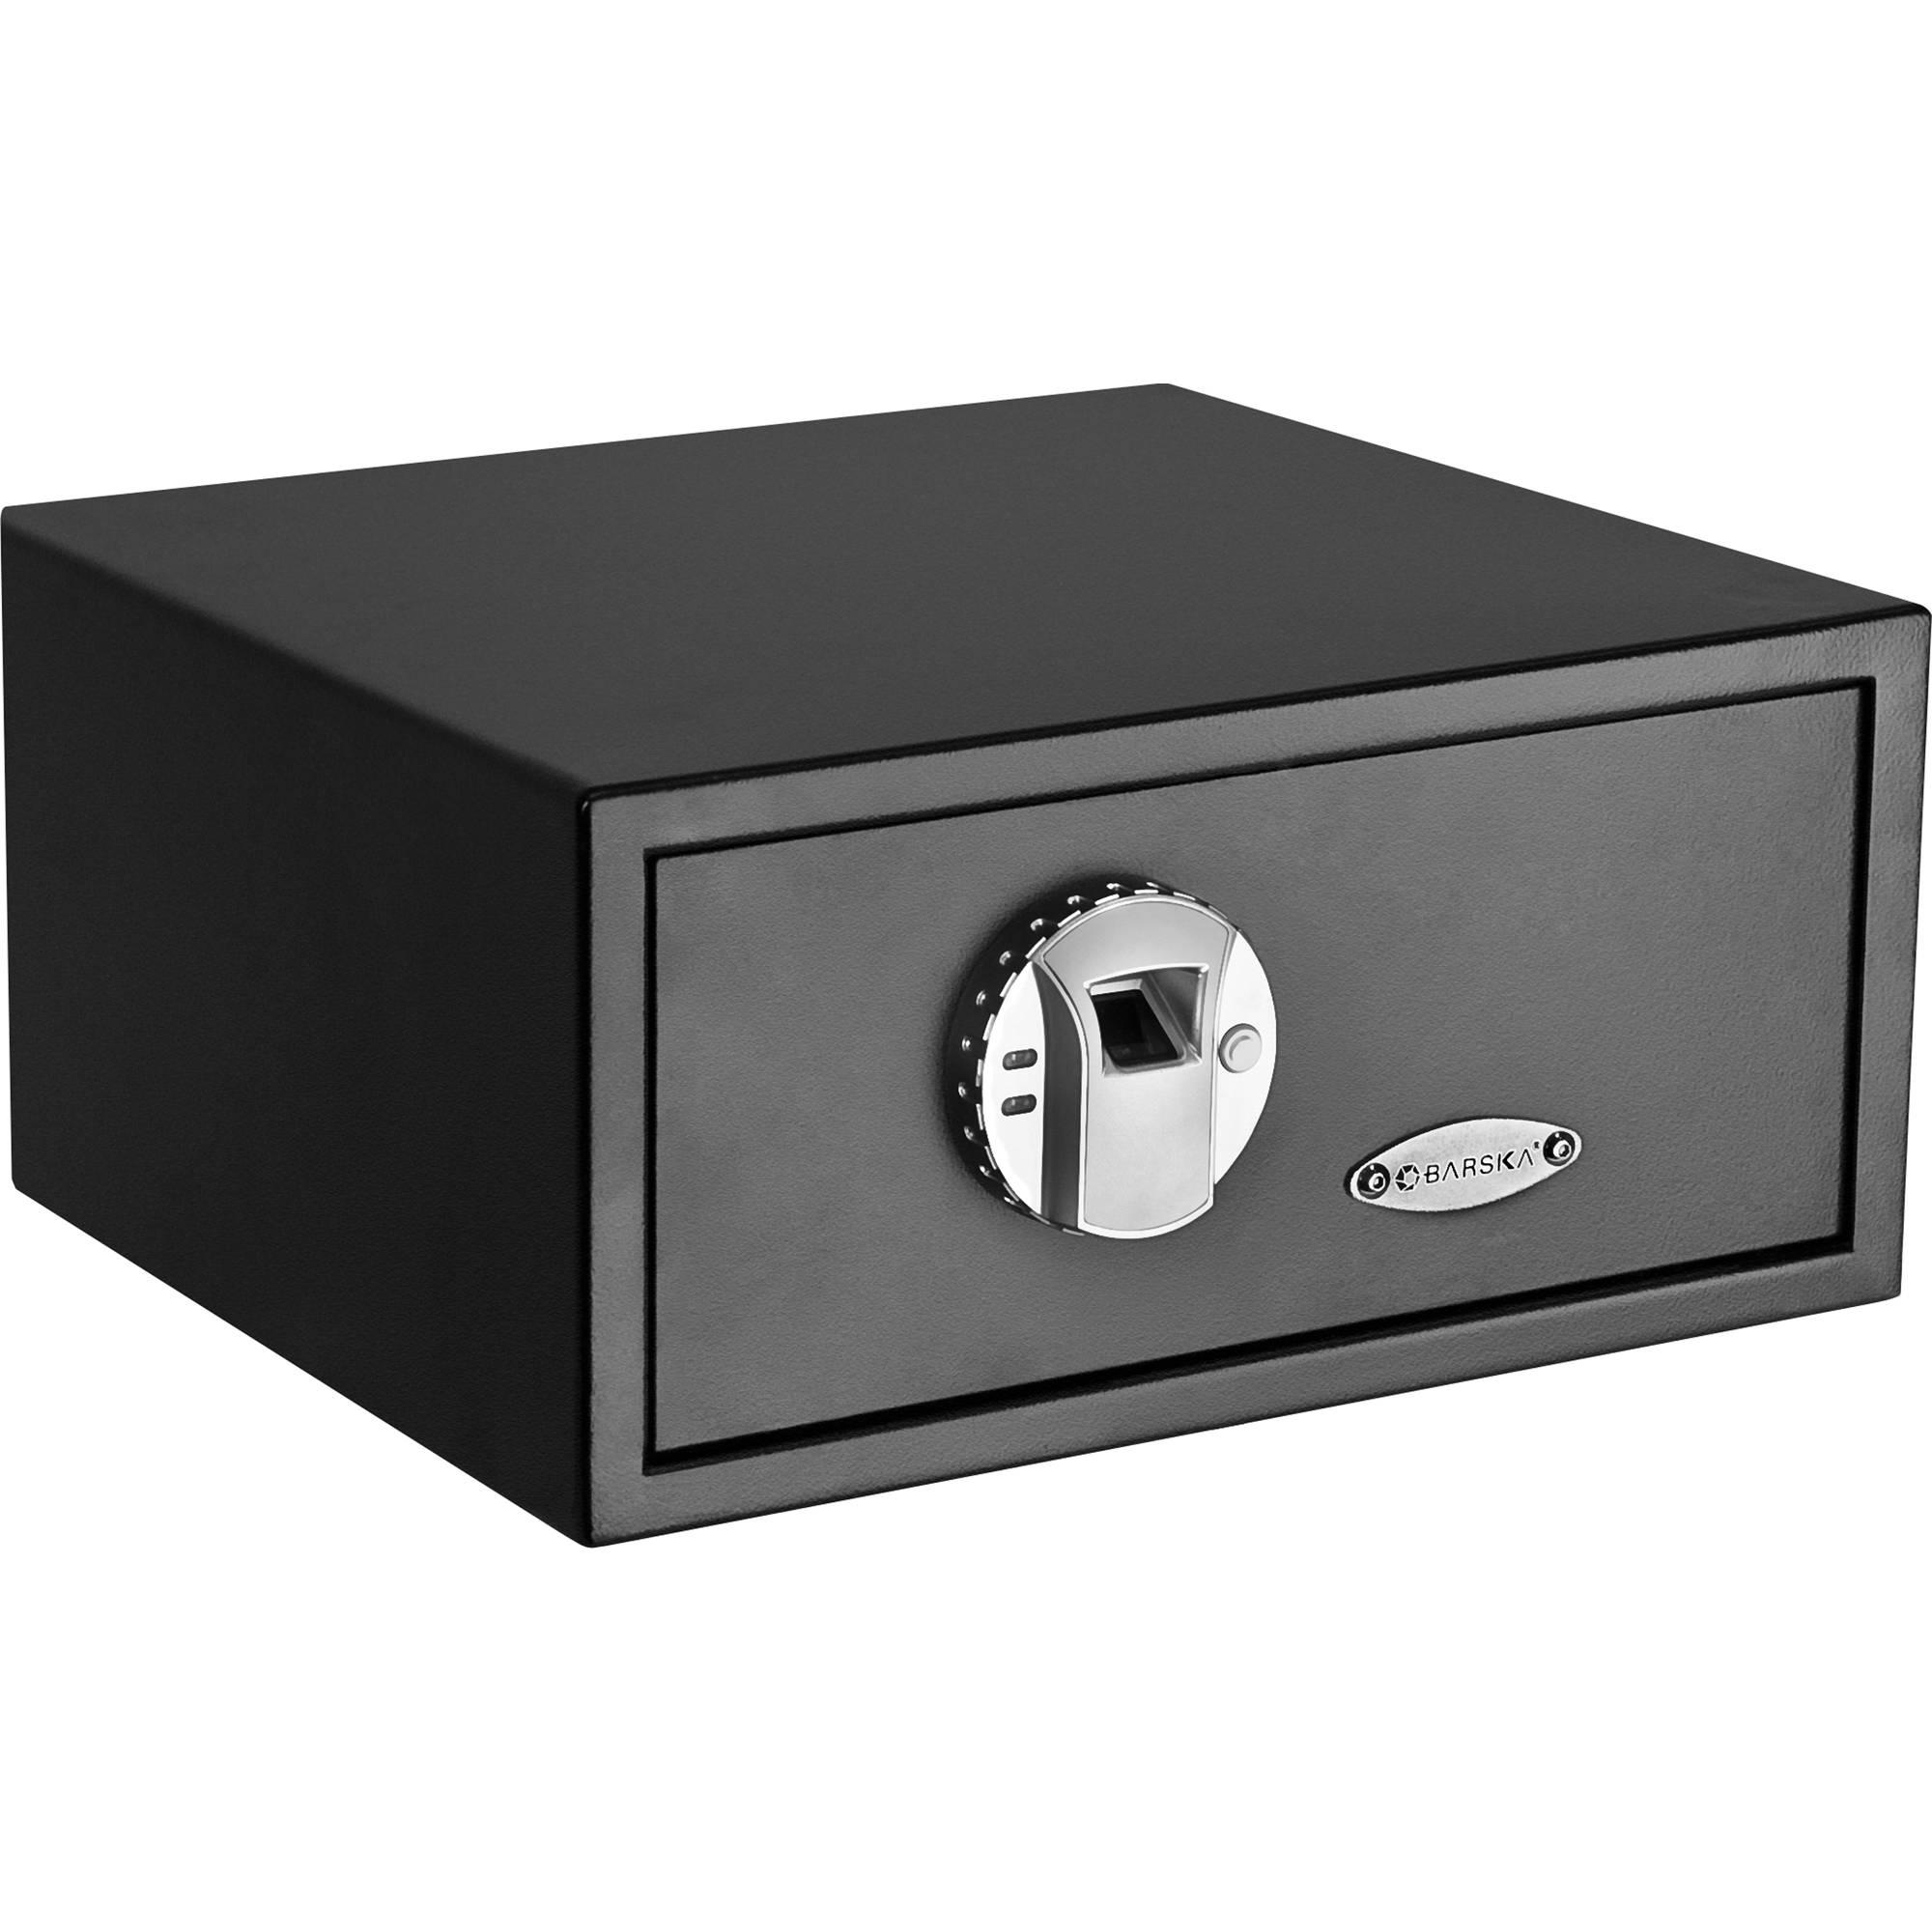 Barska Biometric Fingerprint Safe Ax11224 B H Photo Video